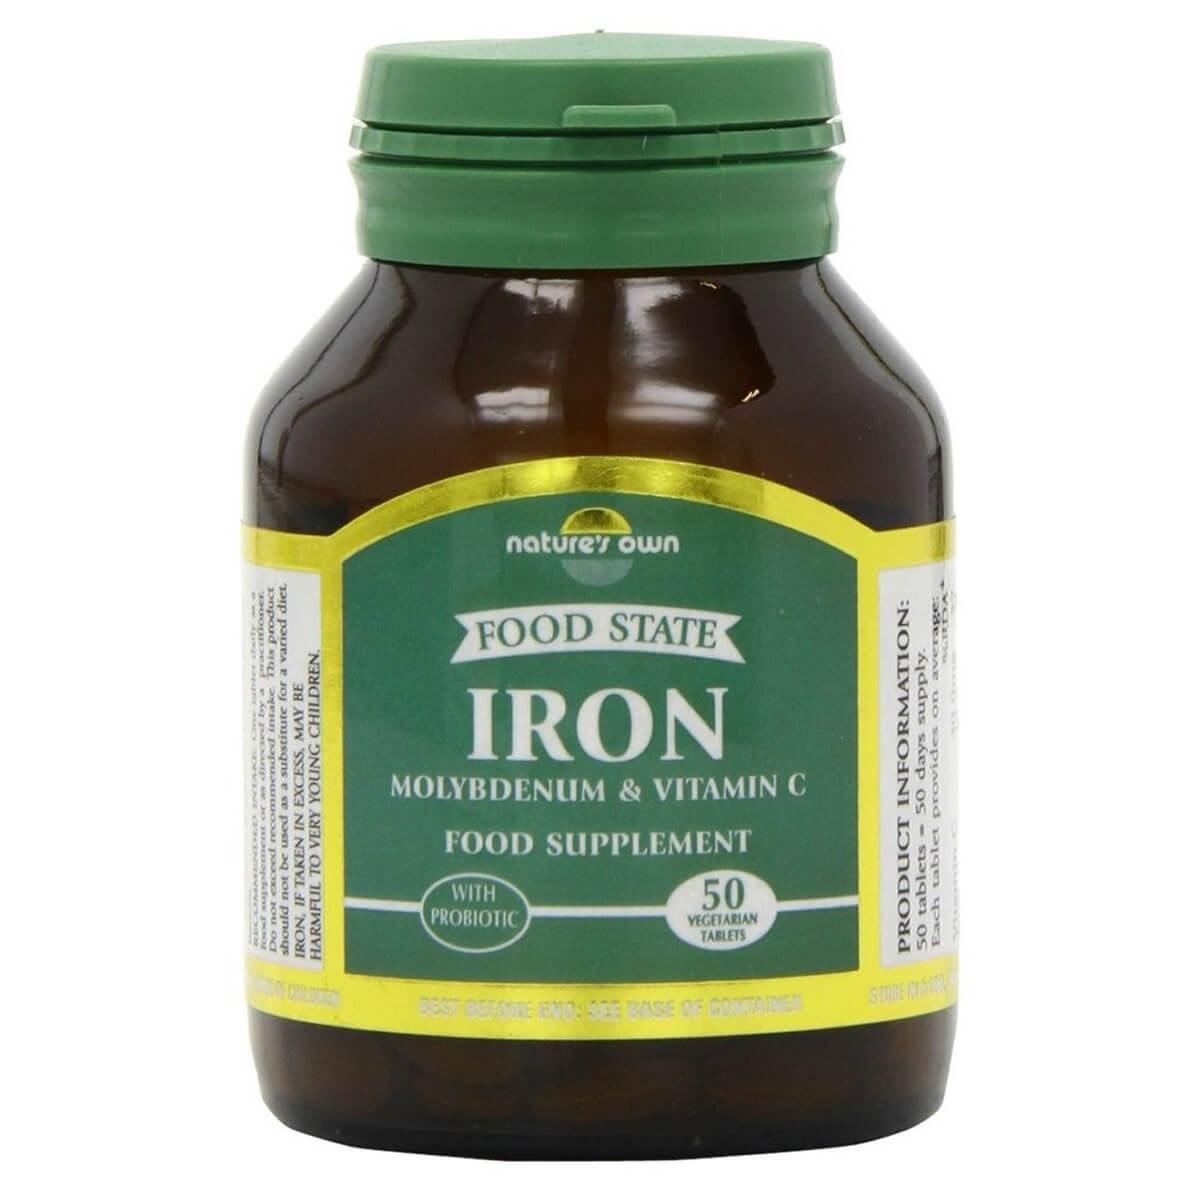 Nature's Own Iron + Molybdenum & Vitamin C